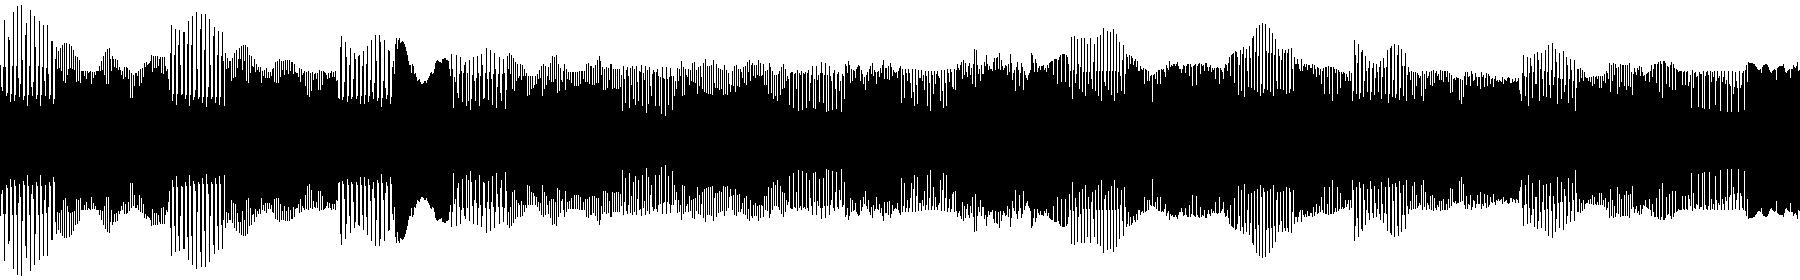 ehp synloop 127 electroanthem2 a